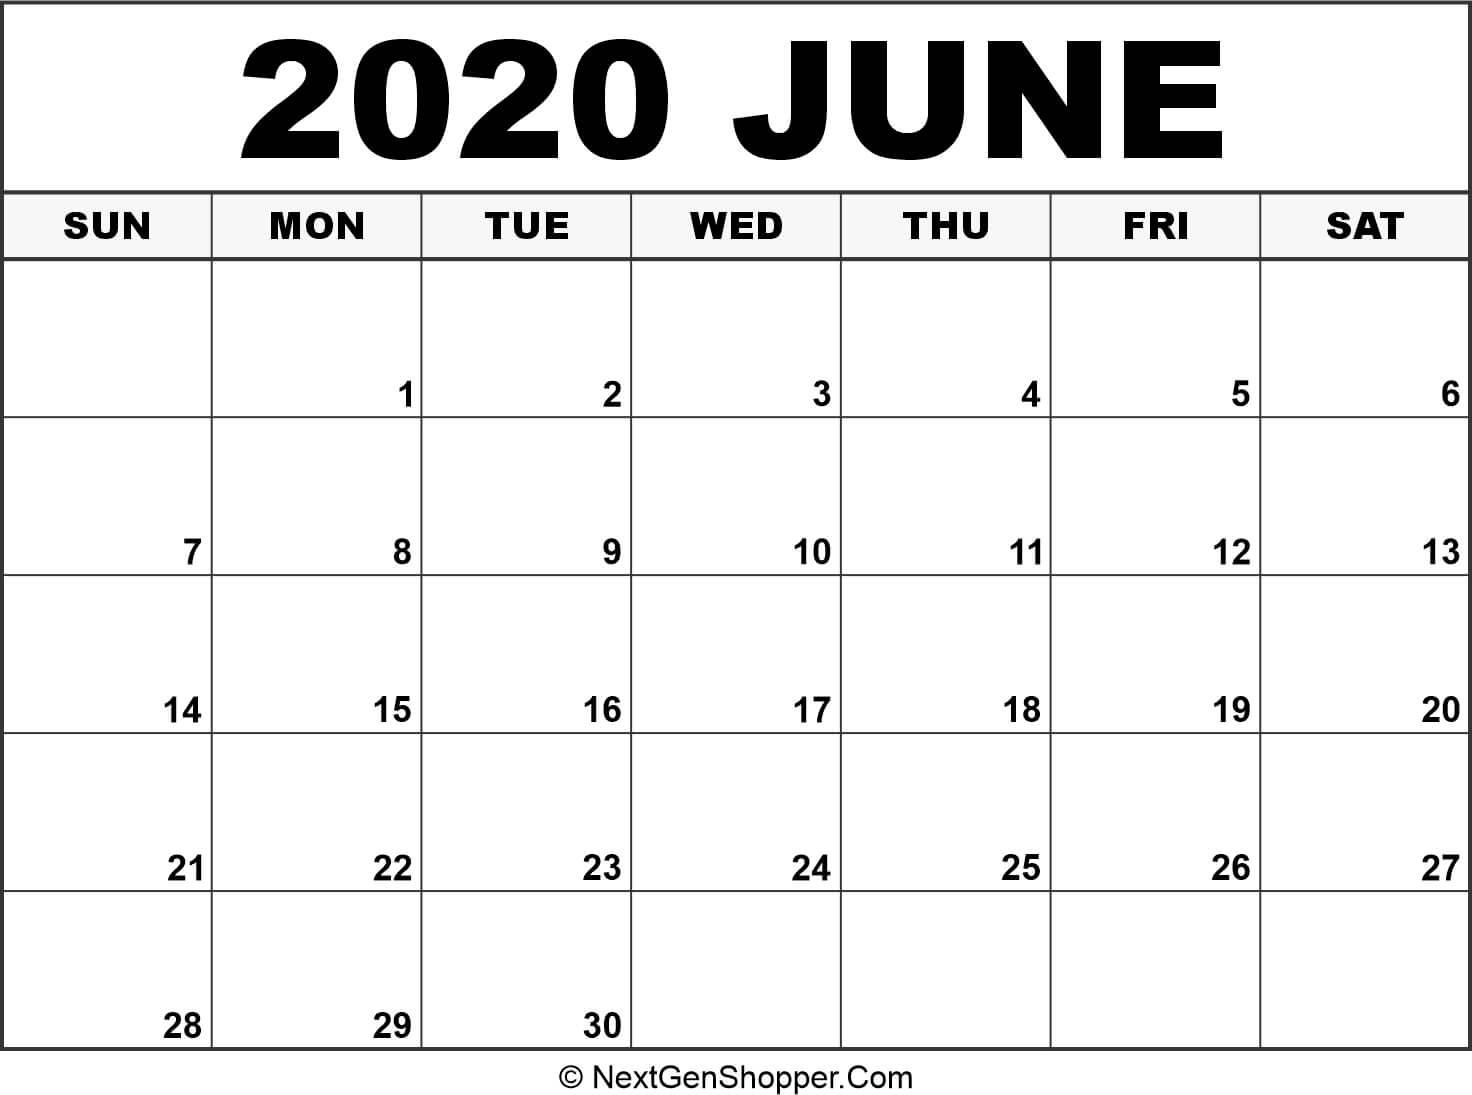 Printable June 2020 Calendar Template - Task Management Guide